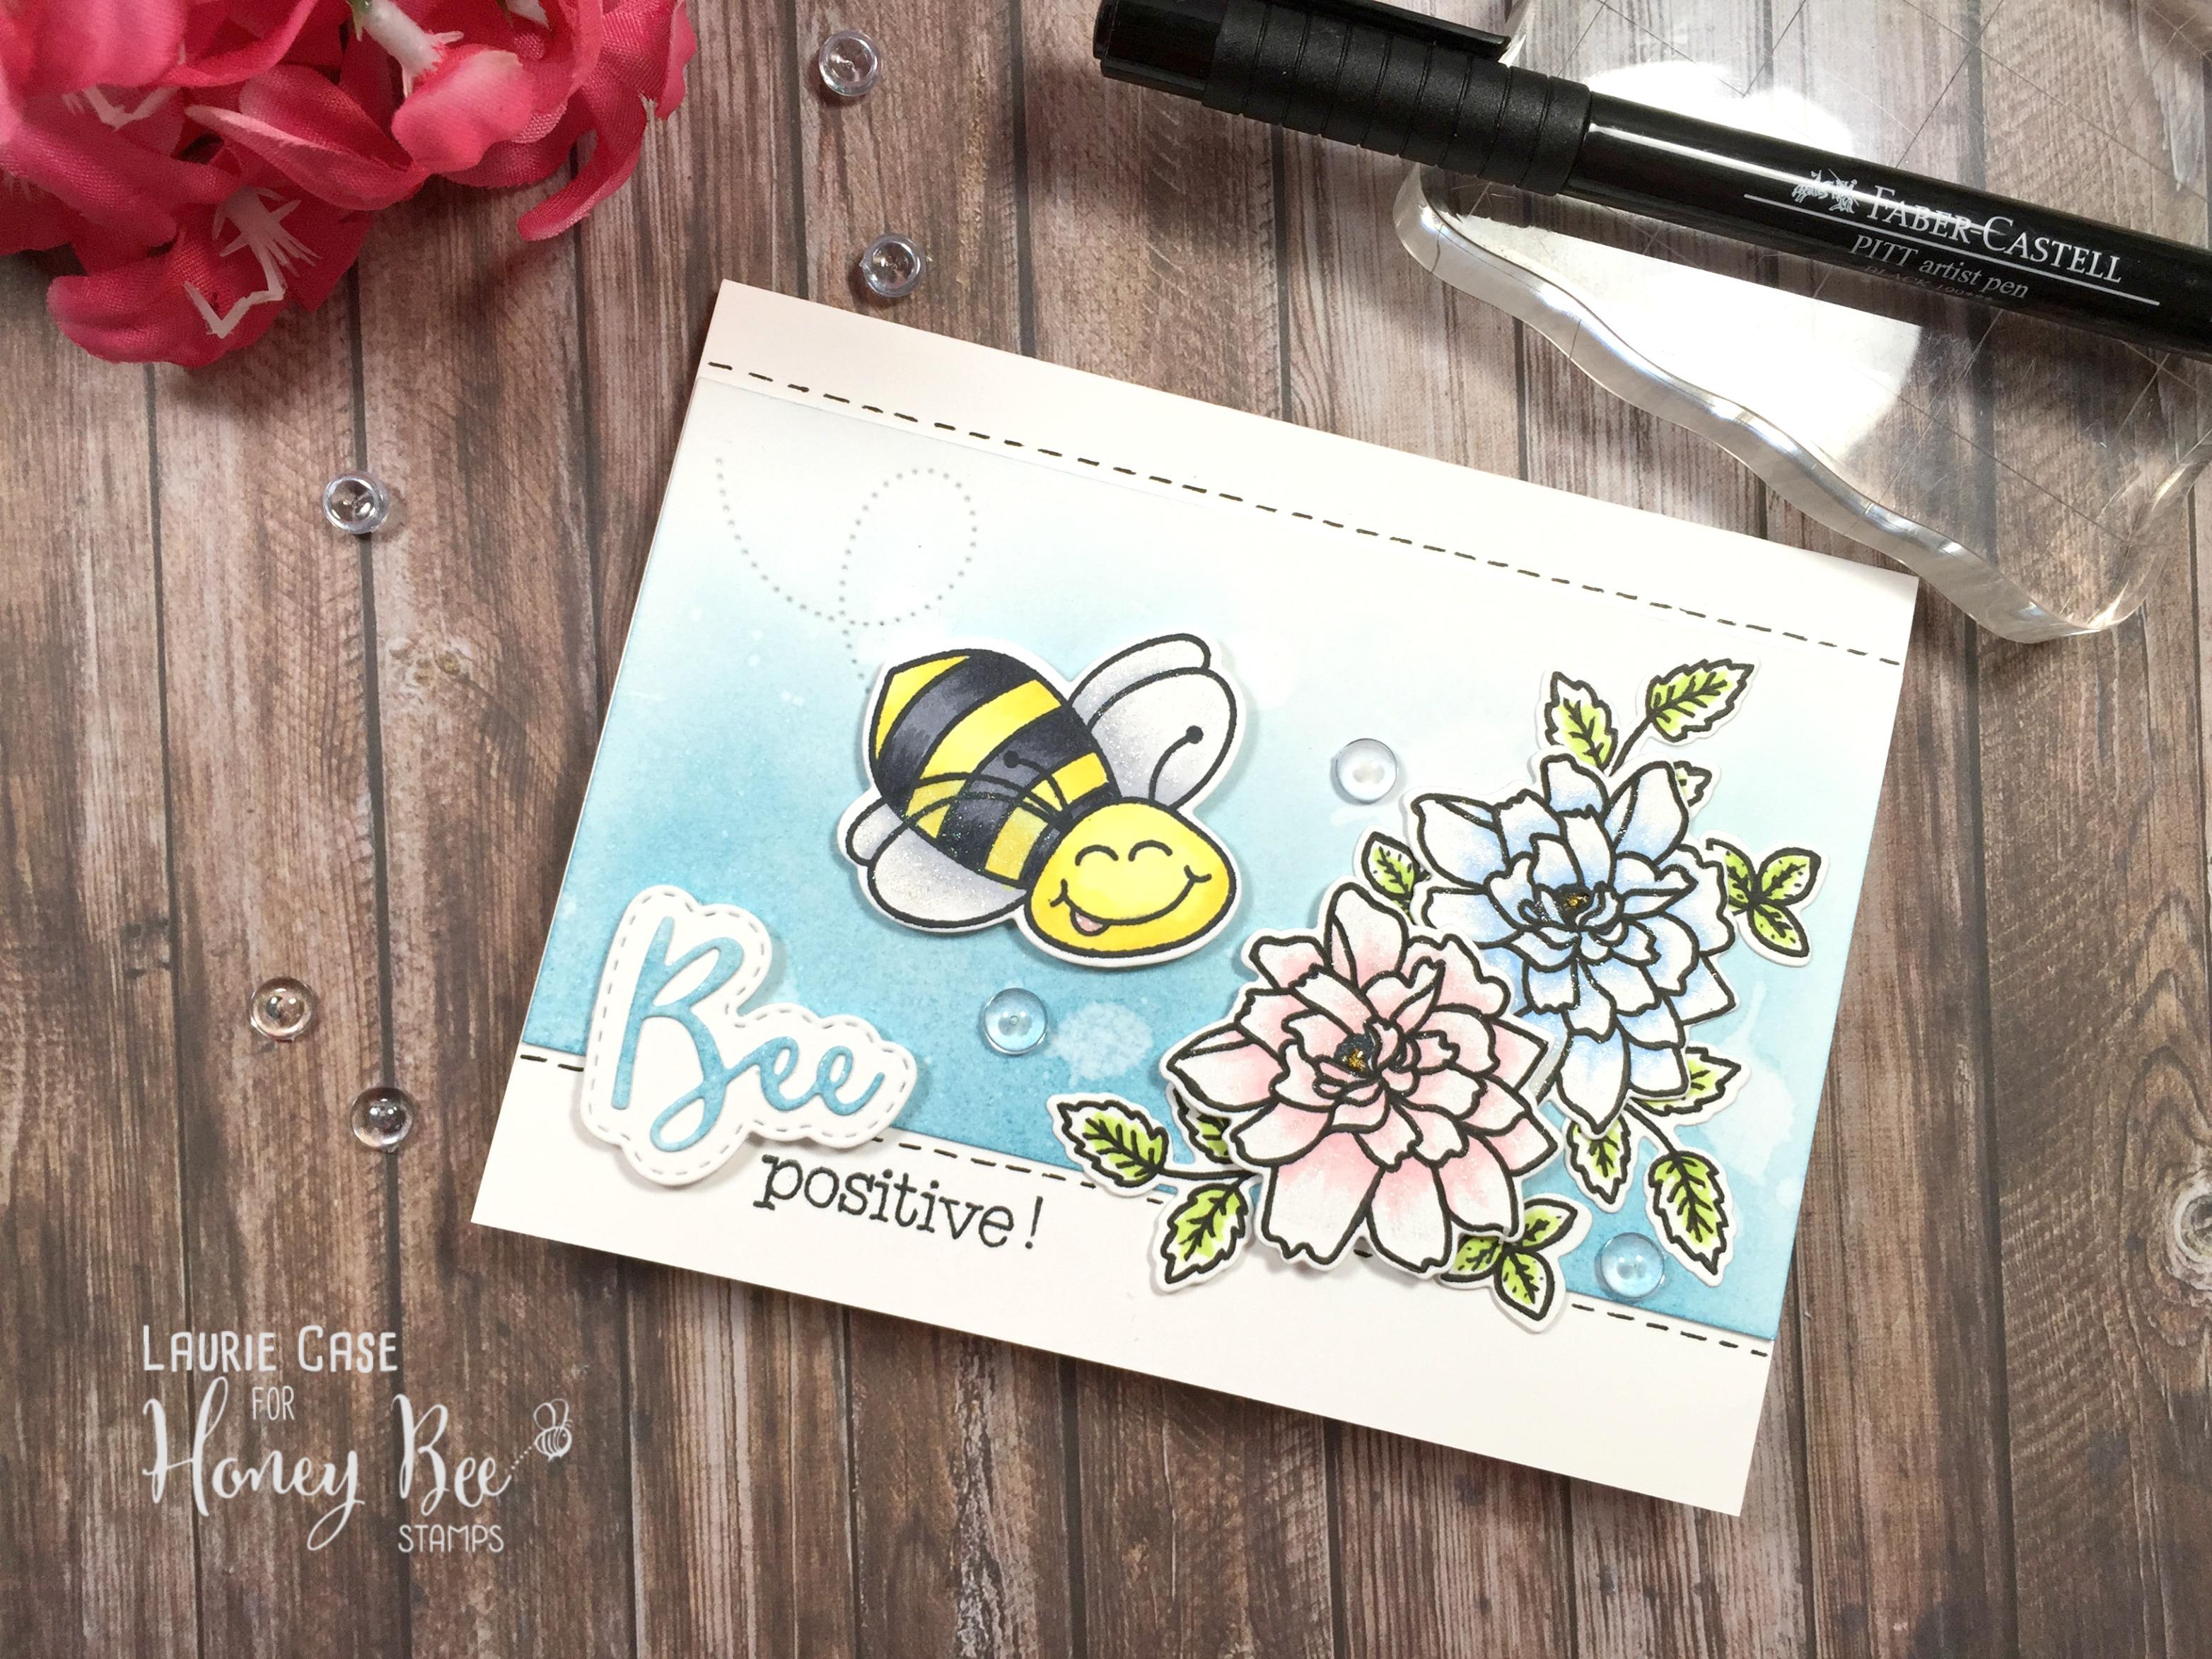 BEE Positive!